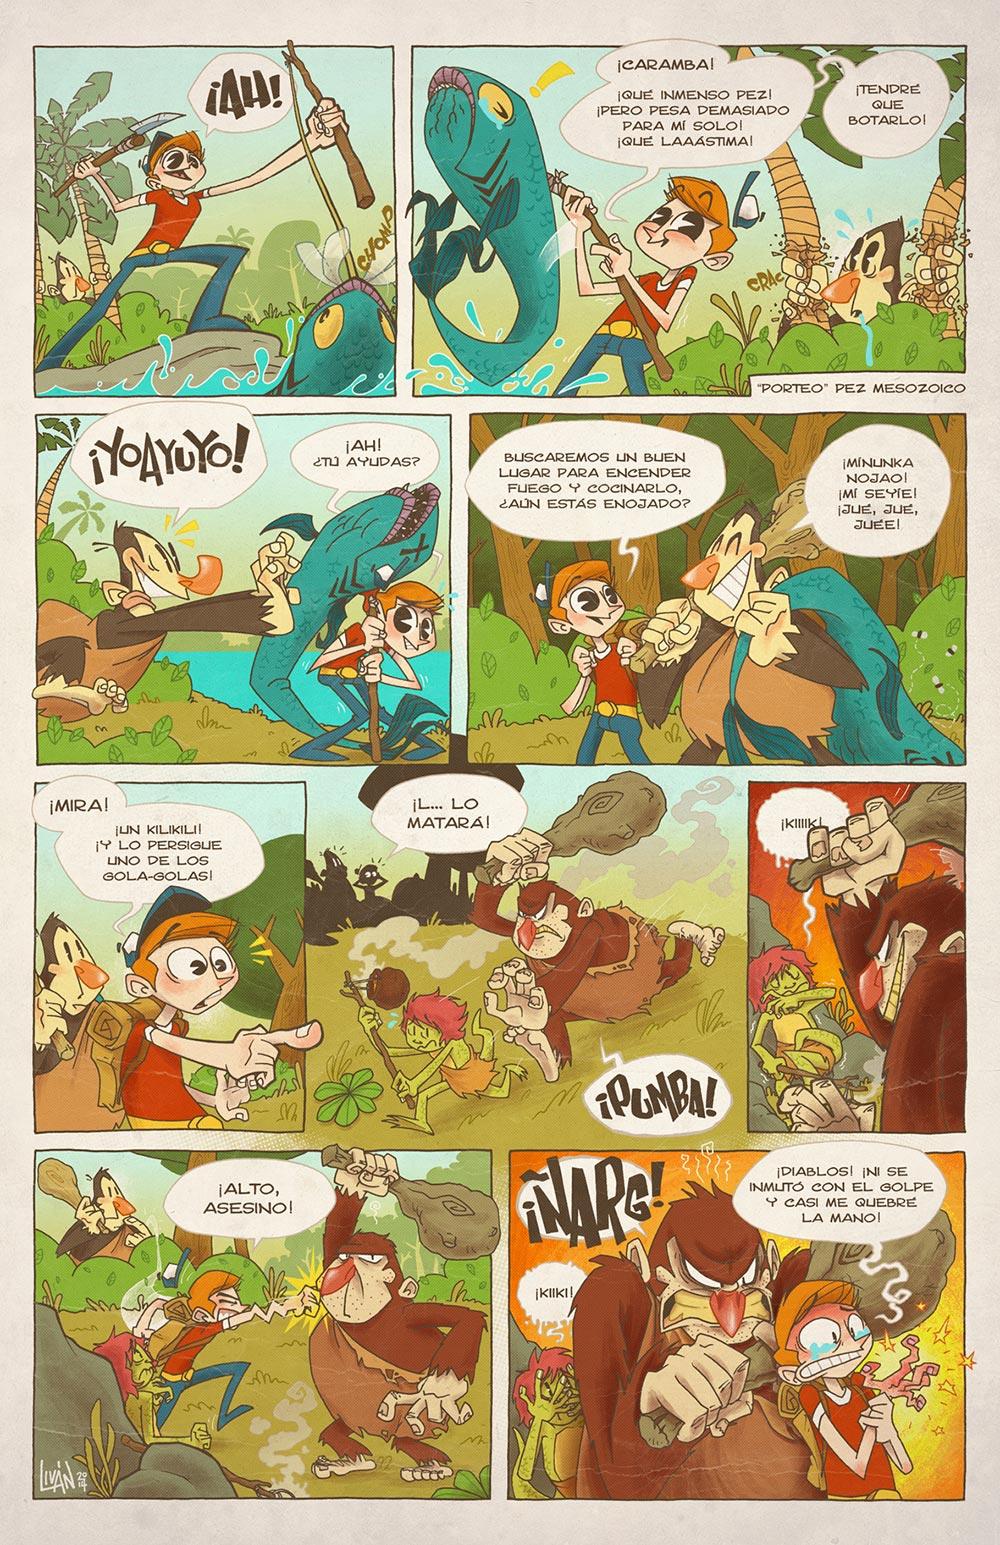 Ilustracion de Livan - Ilustradores chilenos por 2Design Blog